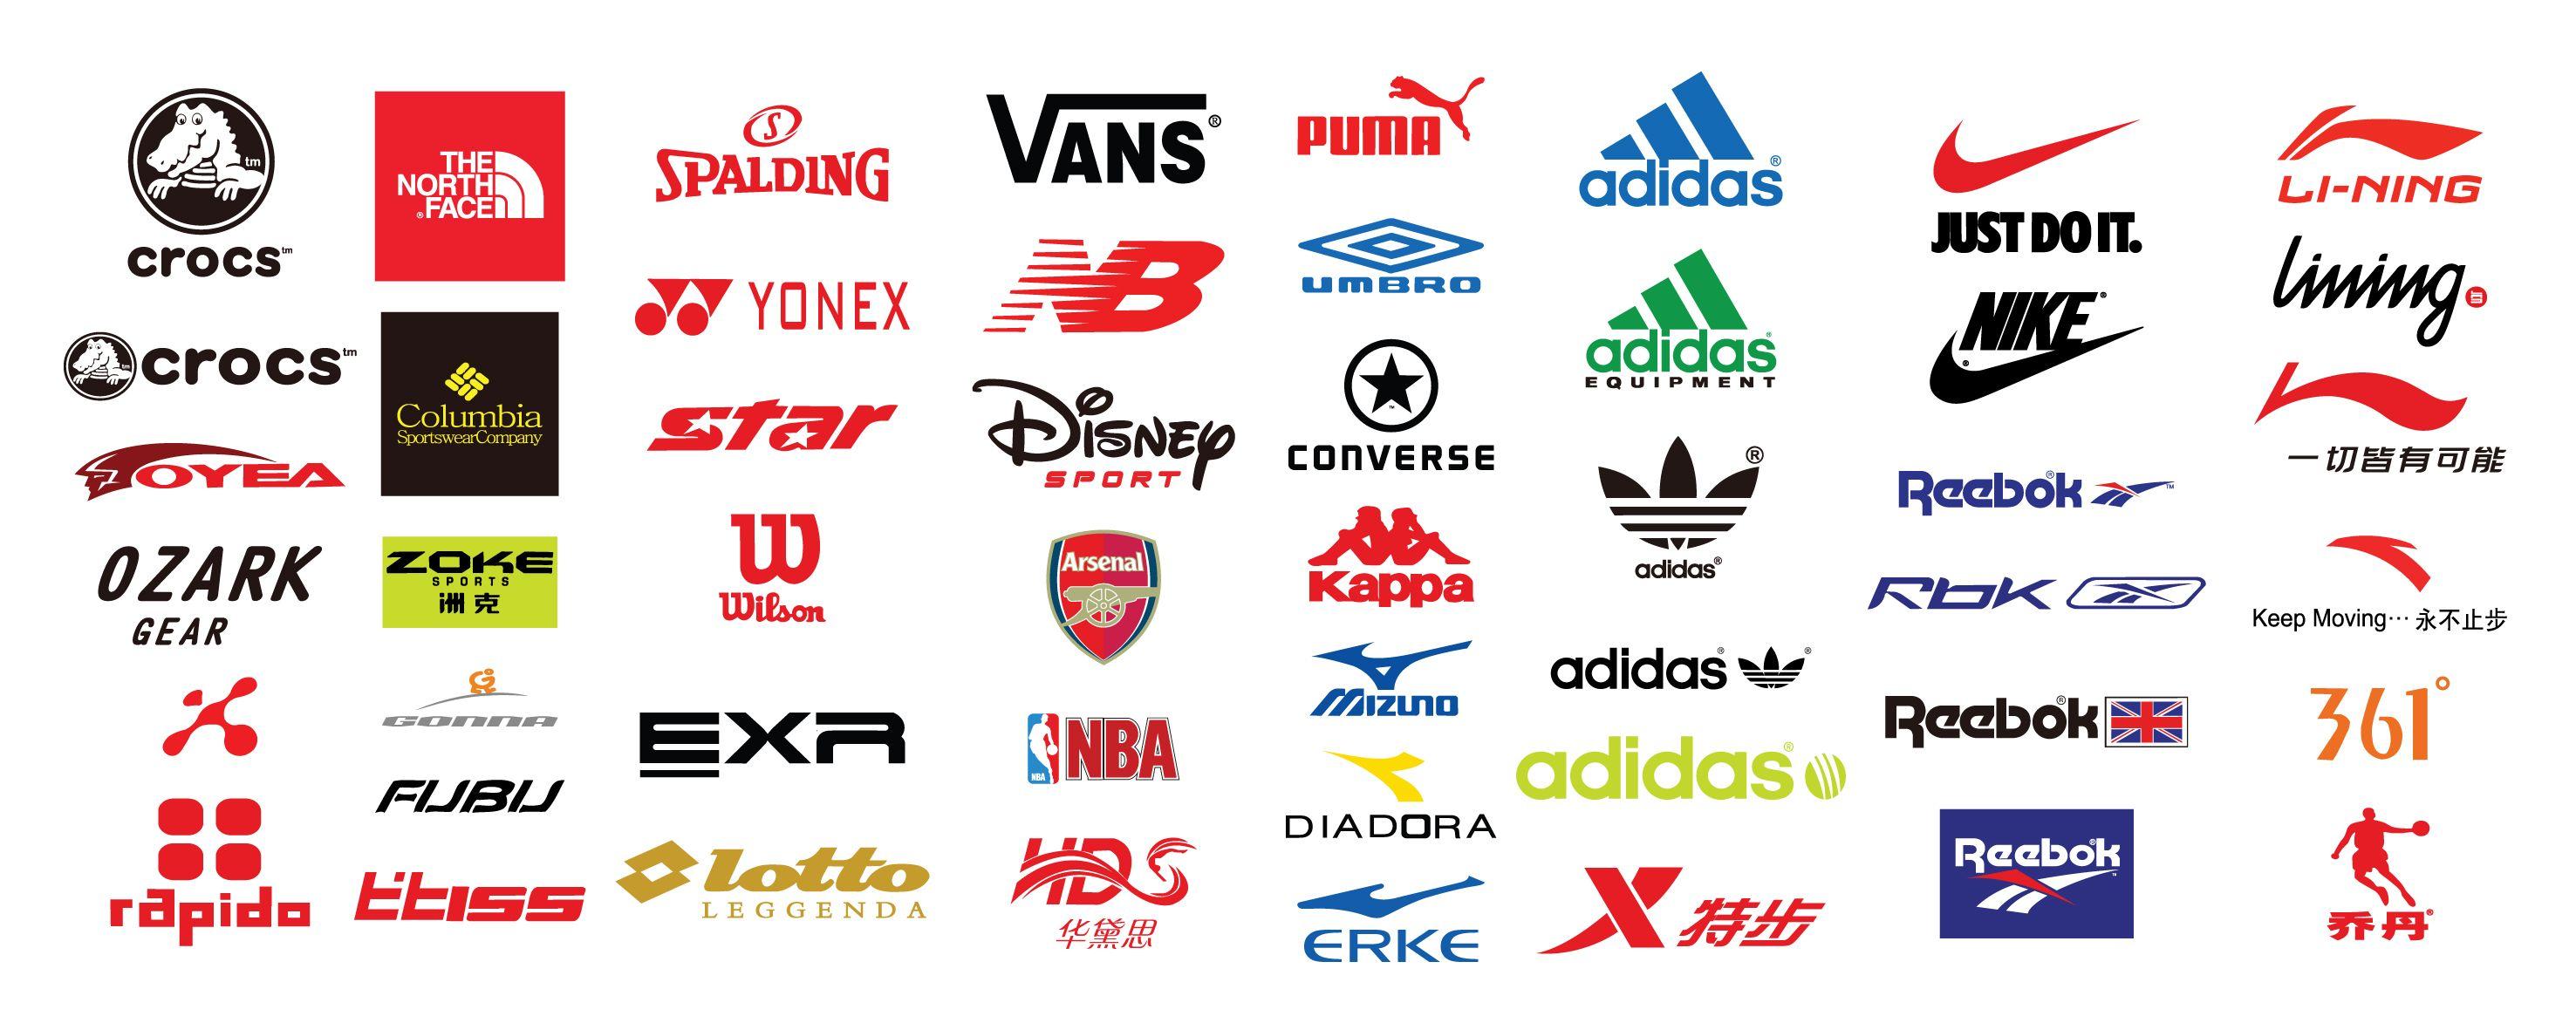 brands logo - photo #6